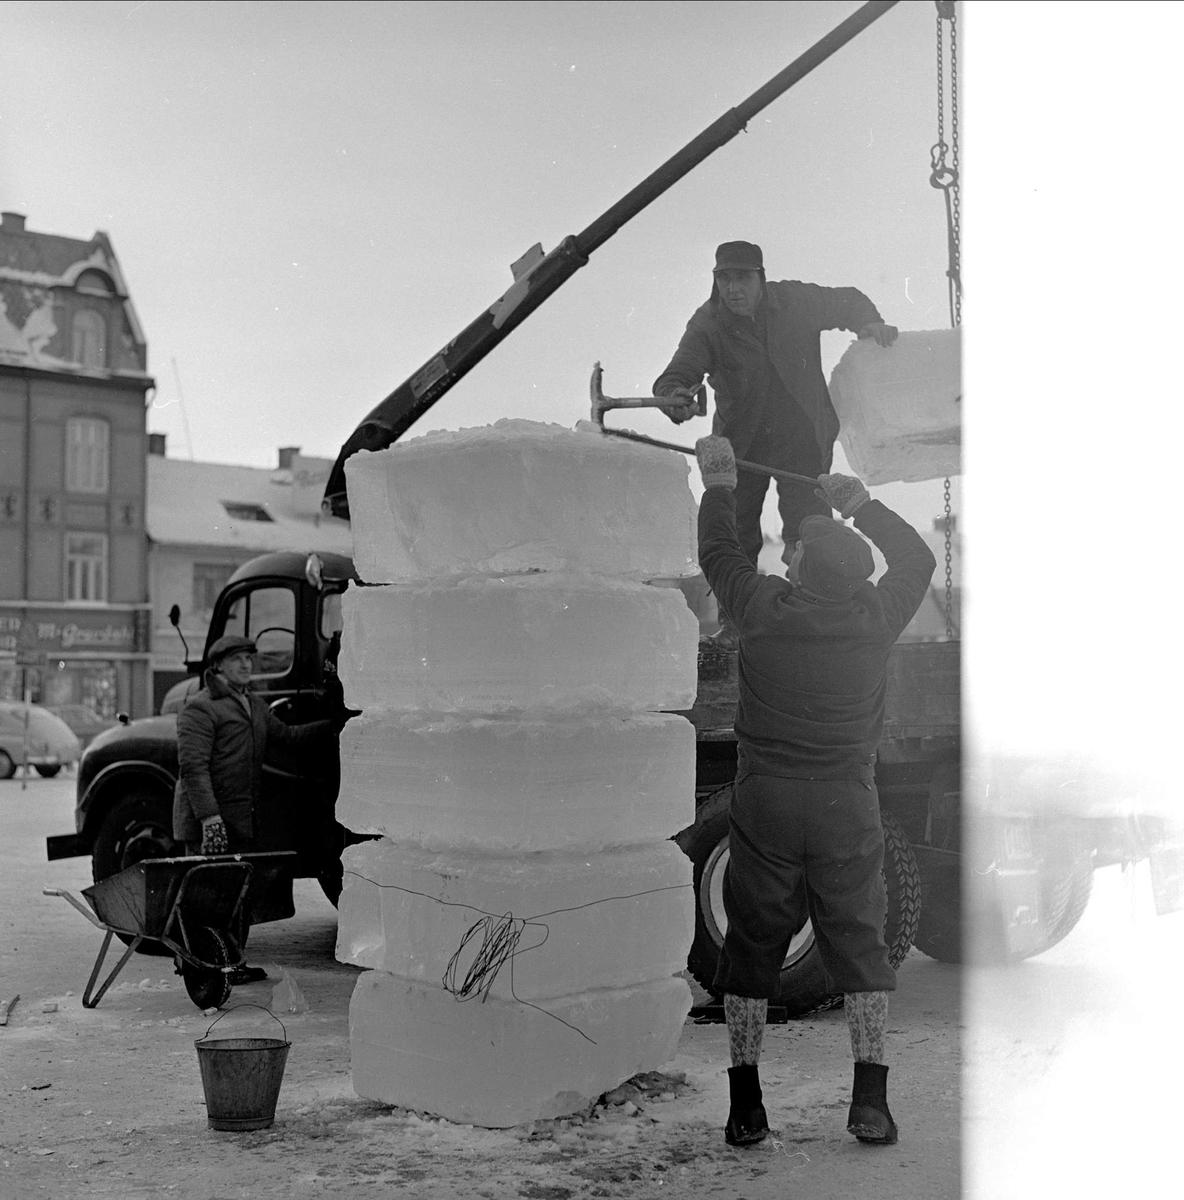 Div. glimt fra Hamar i forbindelse med NM på skøyter, 15.01.1963. Arbeid med isblokker.